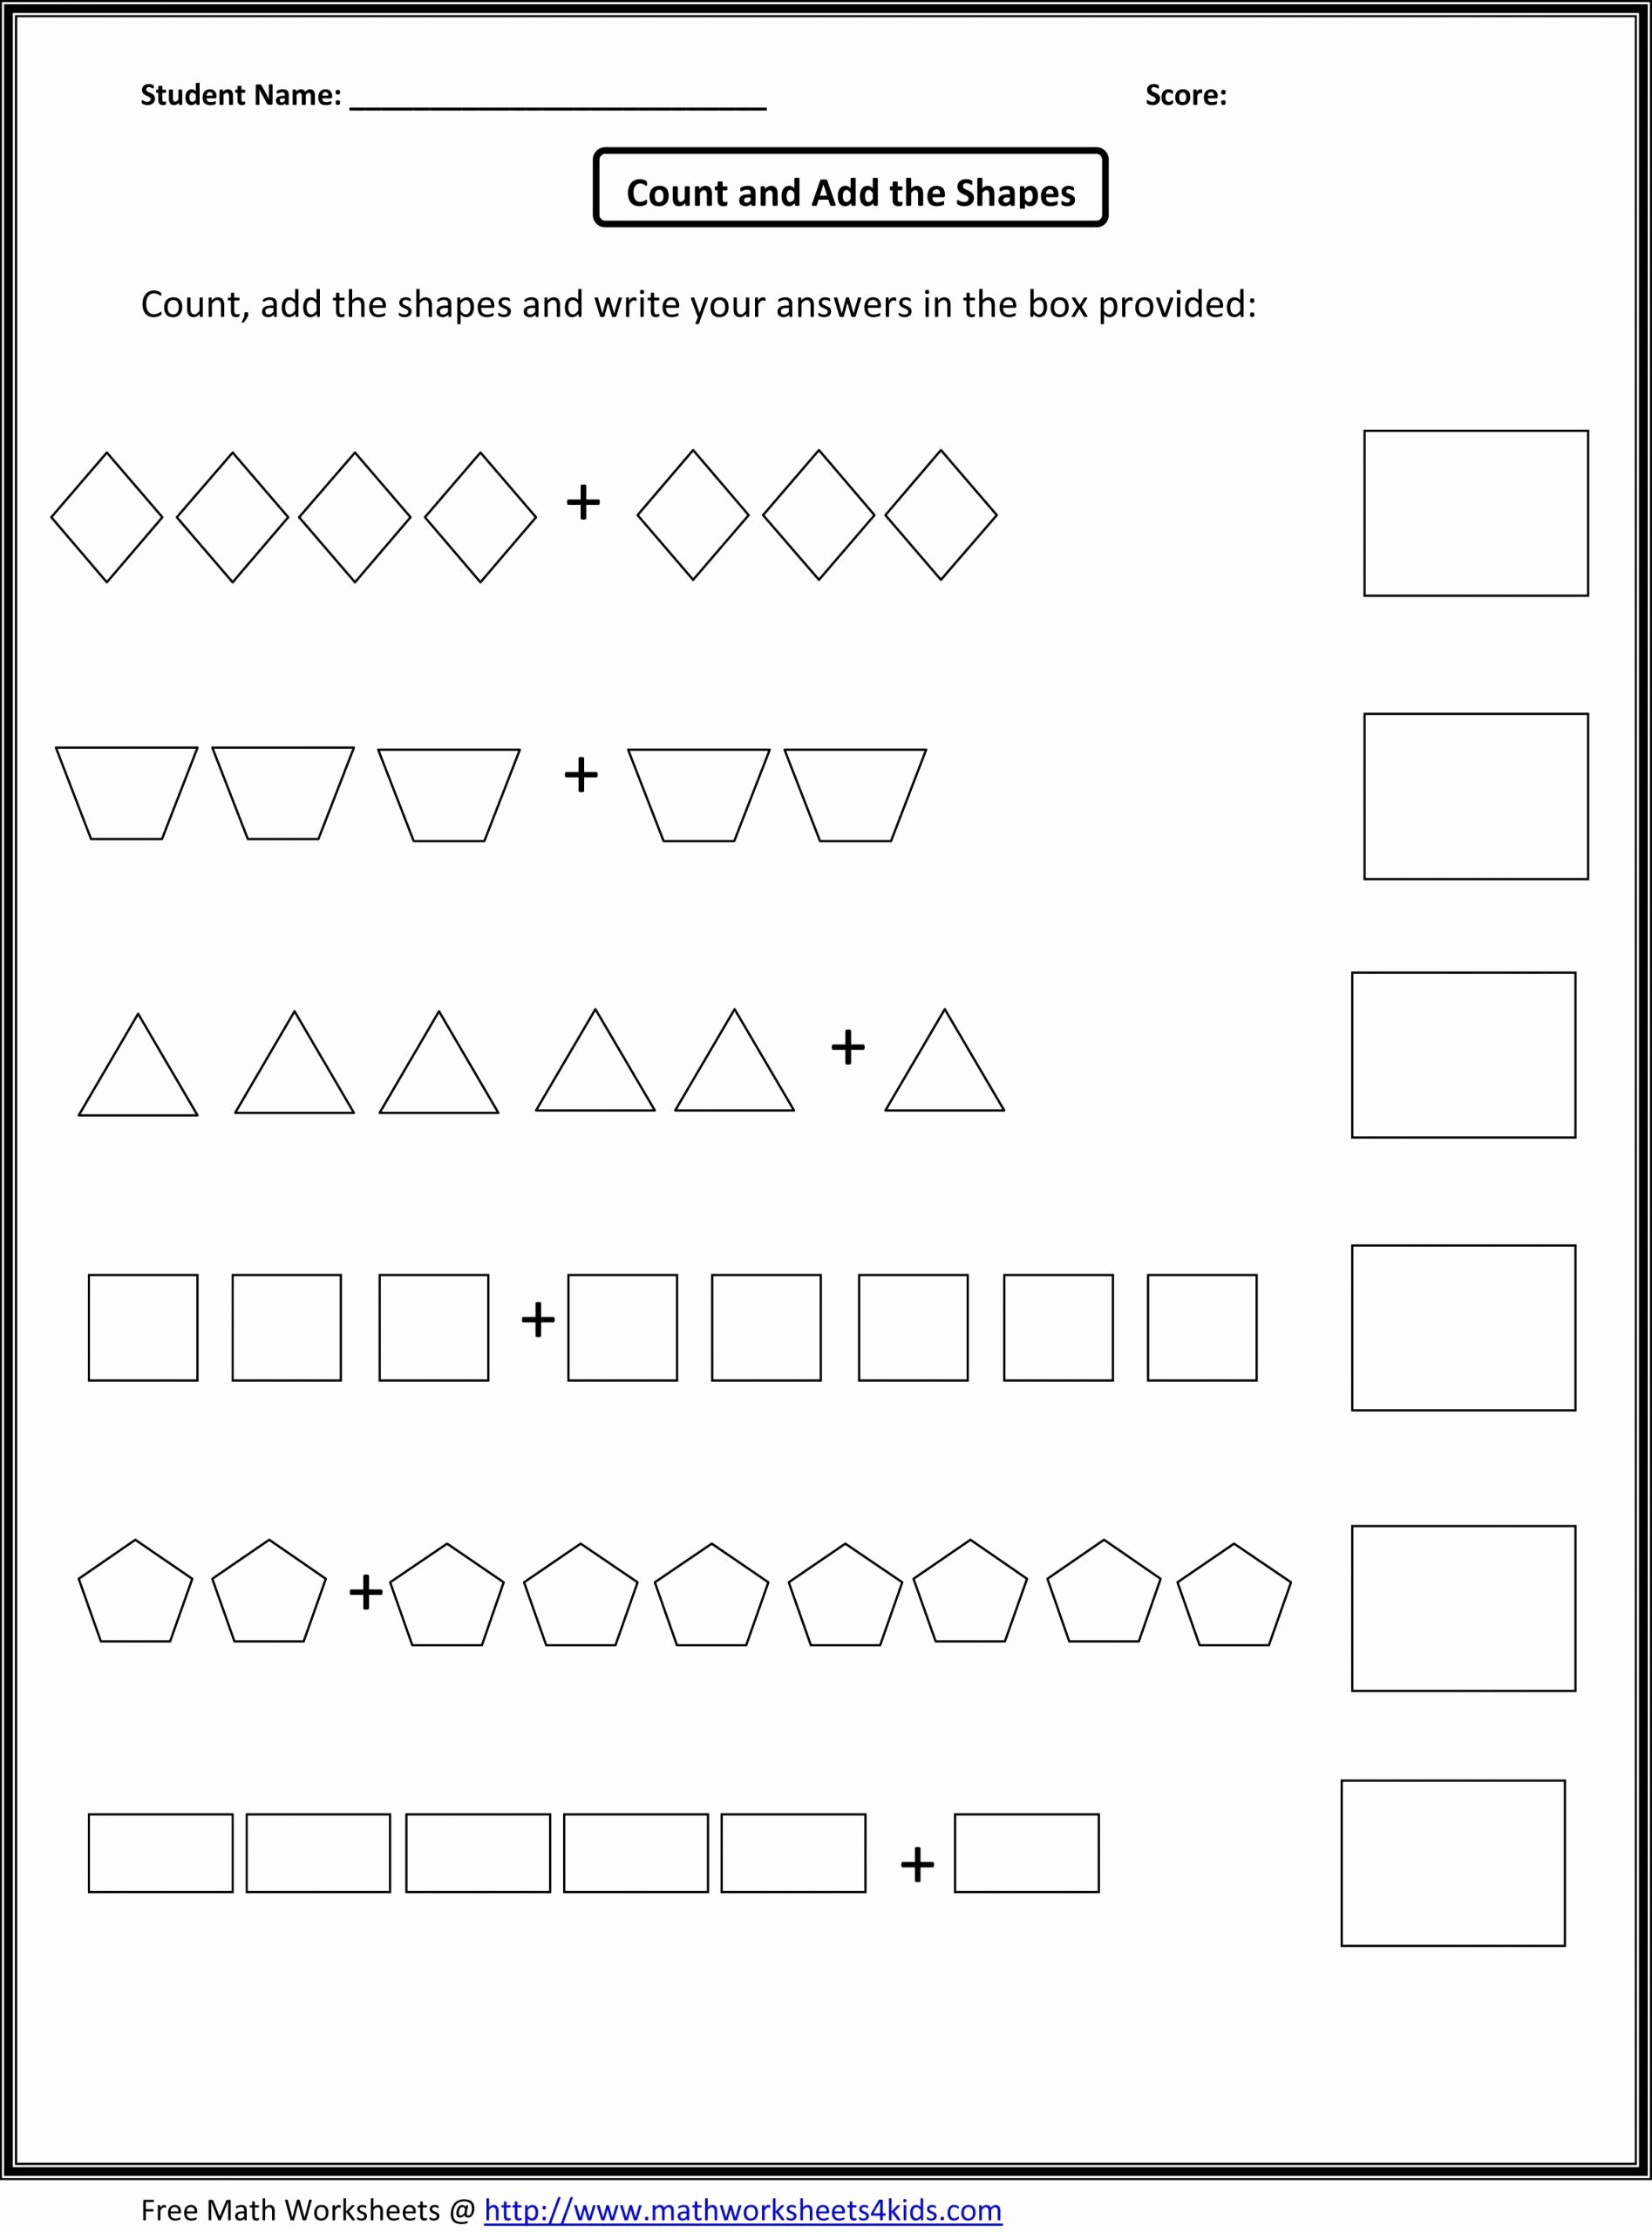 Free Homeschooling Worksheets for Preschoolers Ideas Pin On Mathematics